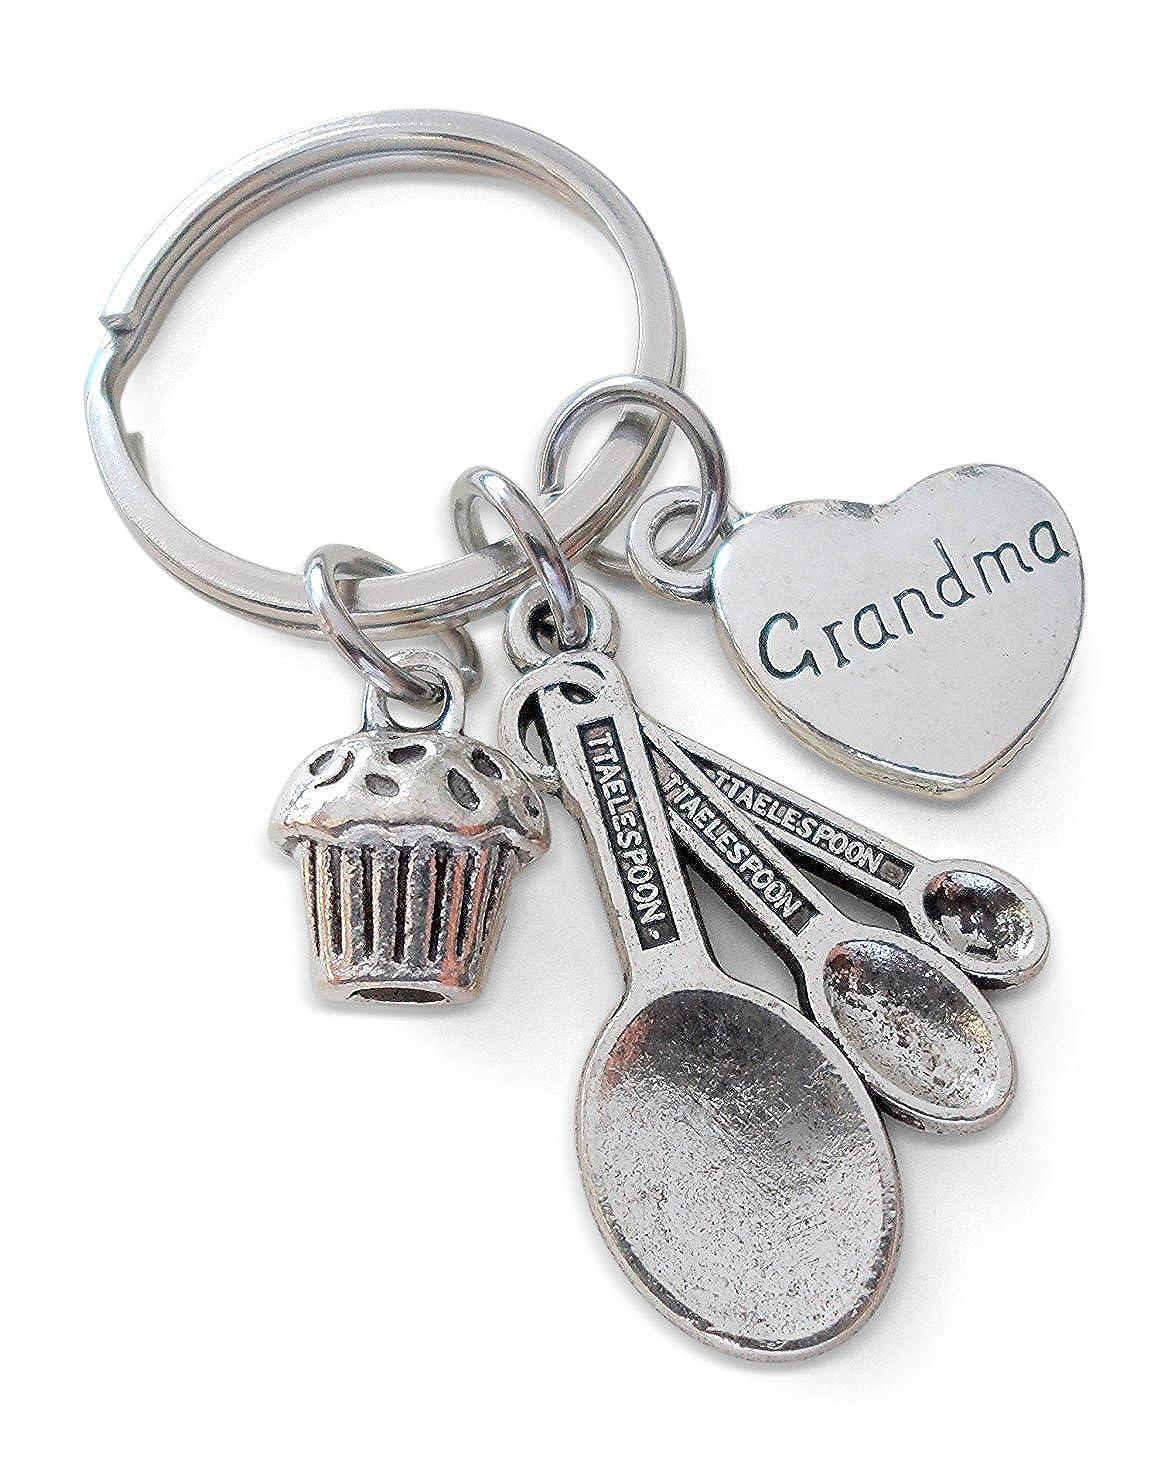 Grandma's Baking Keychain, Measuring Spoon Cupcake Keychain,You Make Life Sweet Grandma's Baking Keychain 32914000556